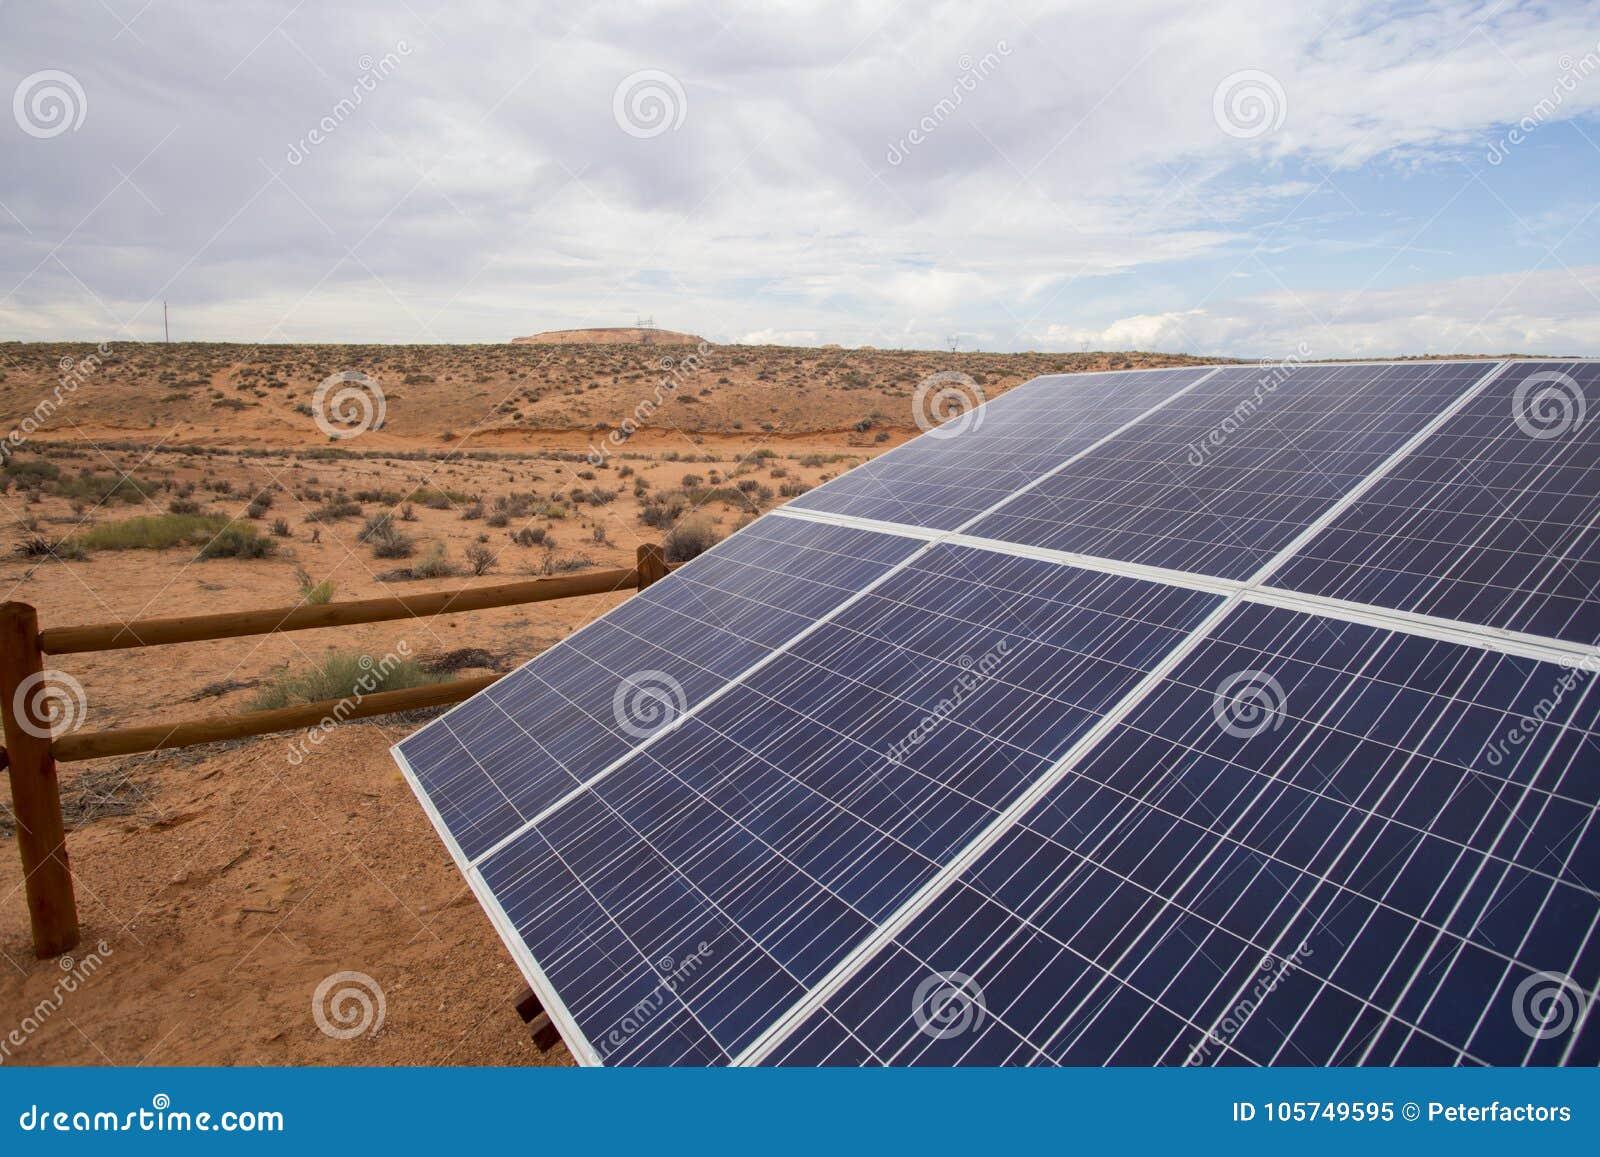 Solar panels in remote area